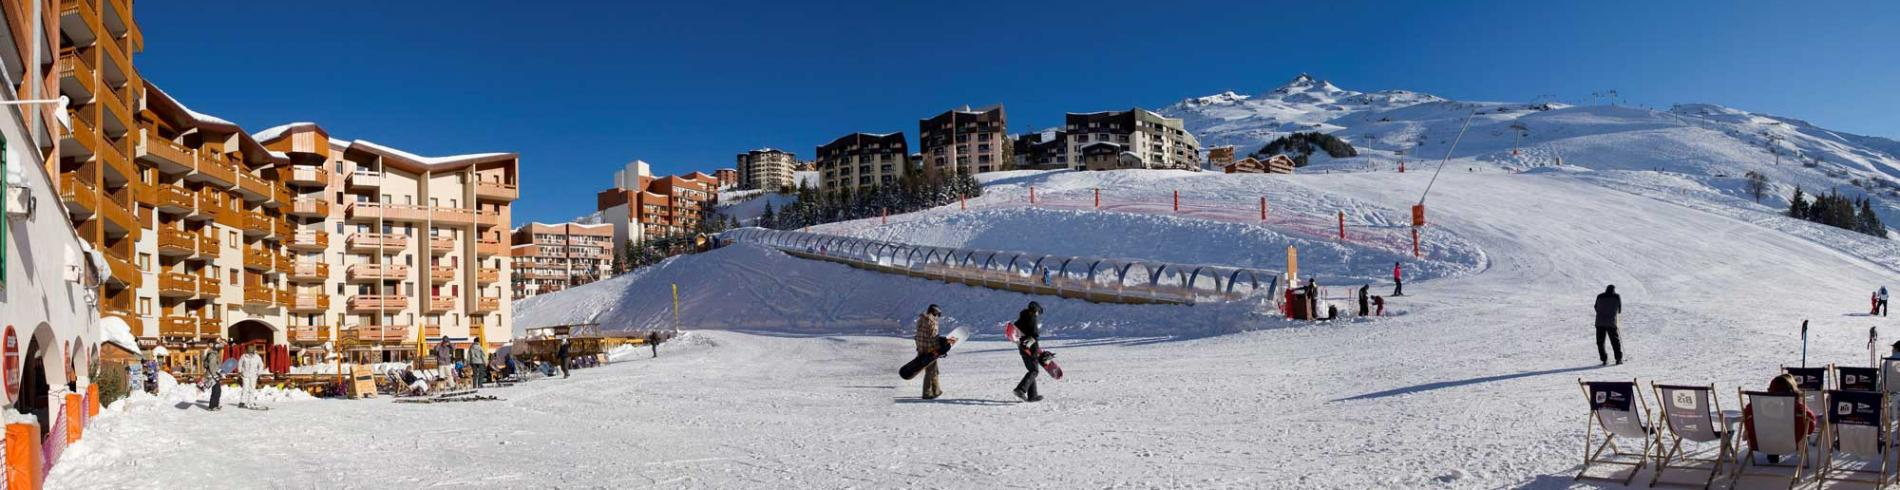 Skiers walking across the snow